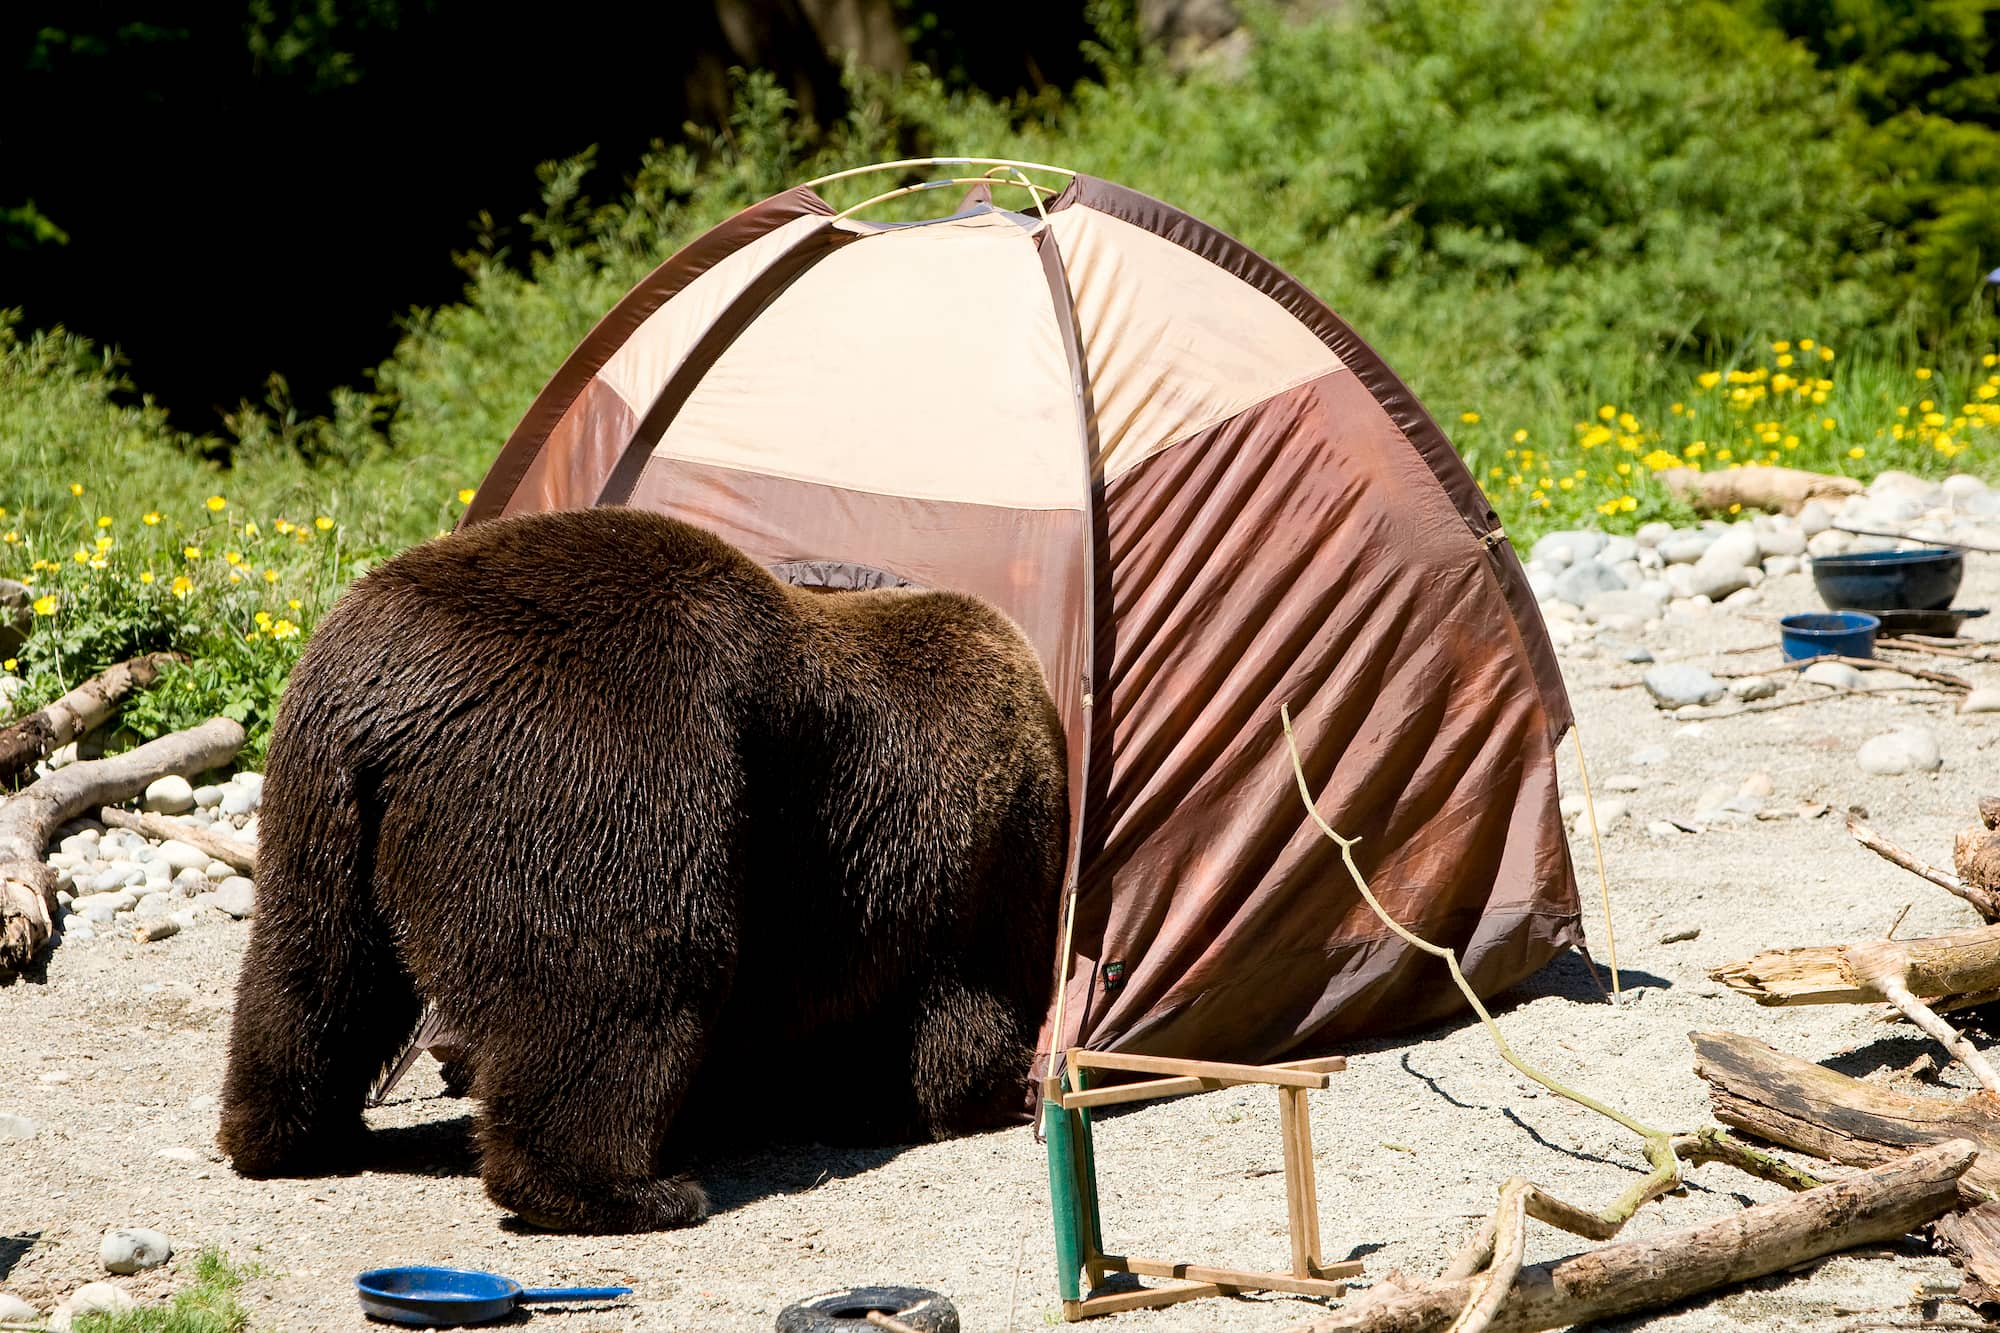 Bear crawling into a tent door.